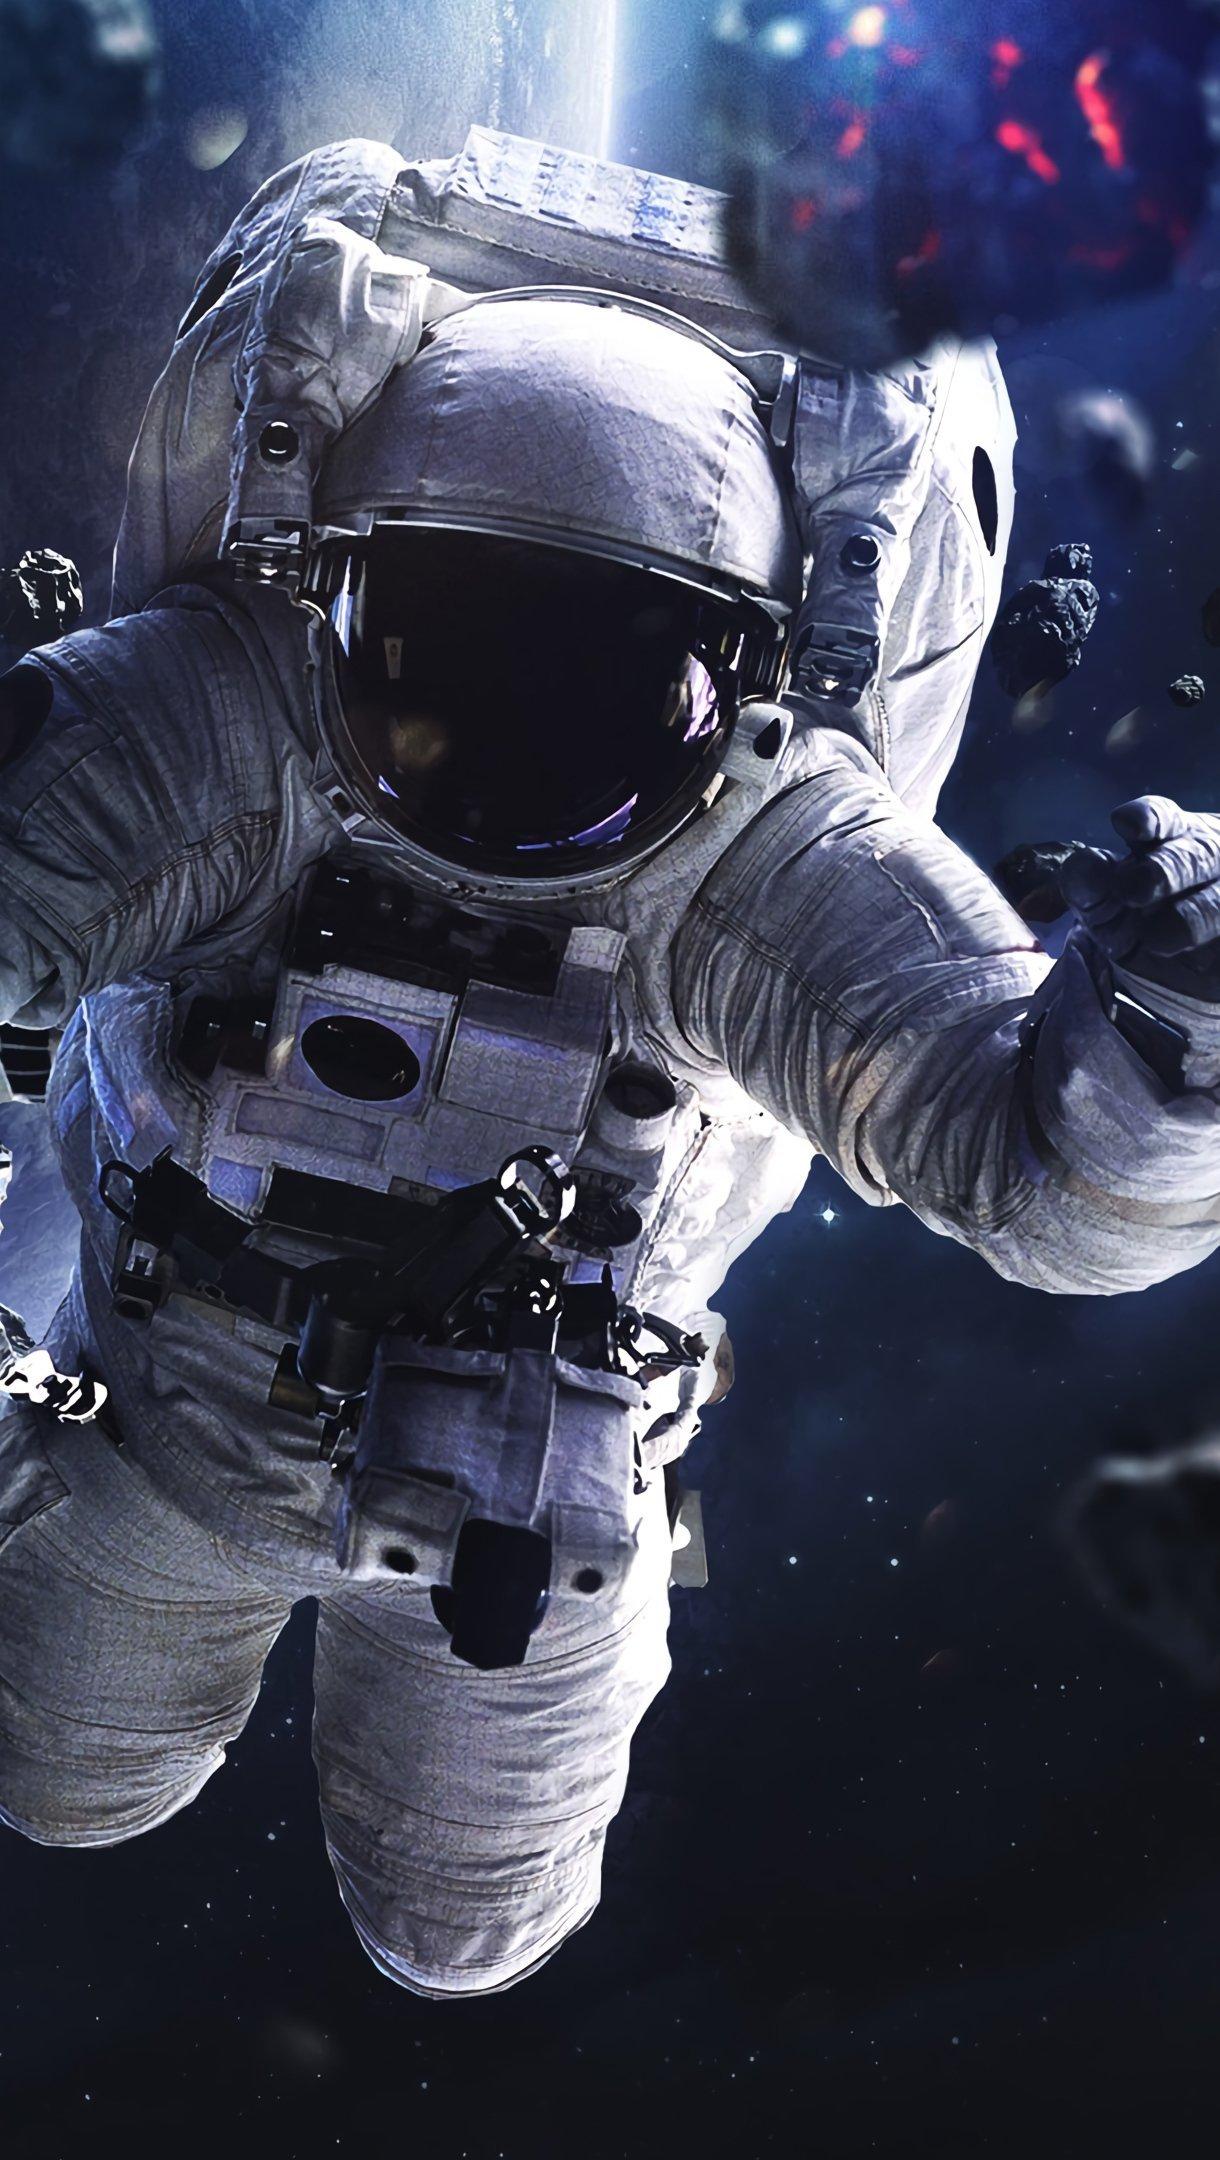 Wallpaper Astronaut floating around asteroids Vertical